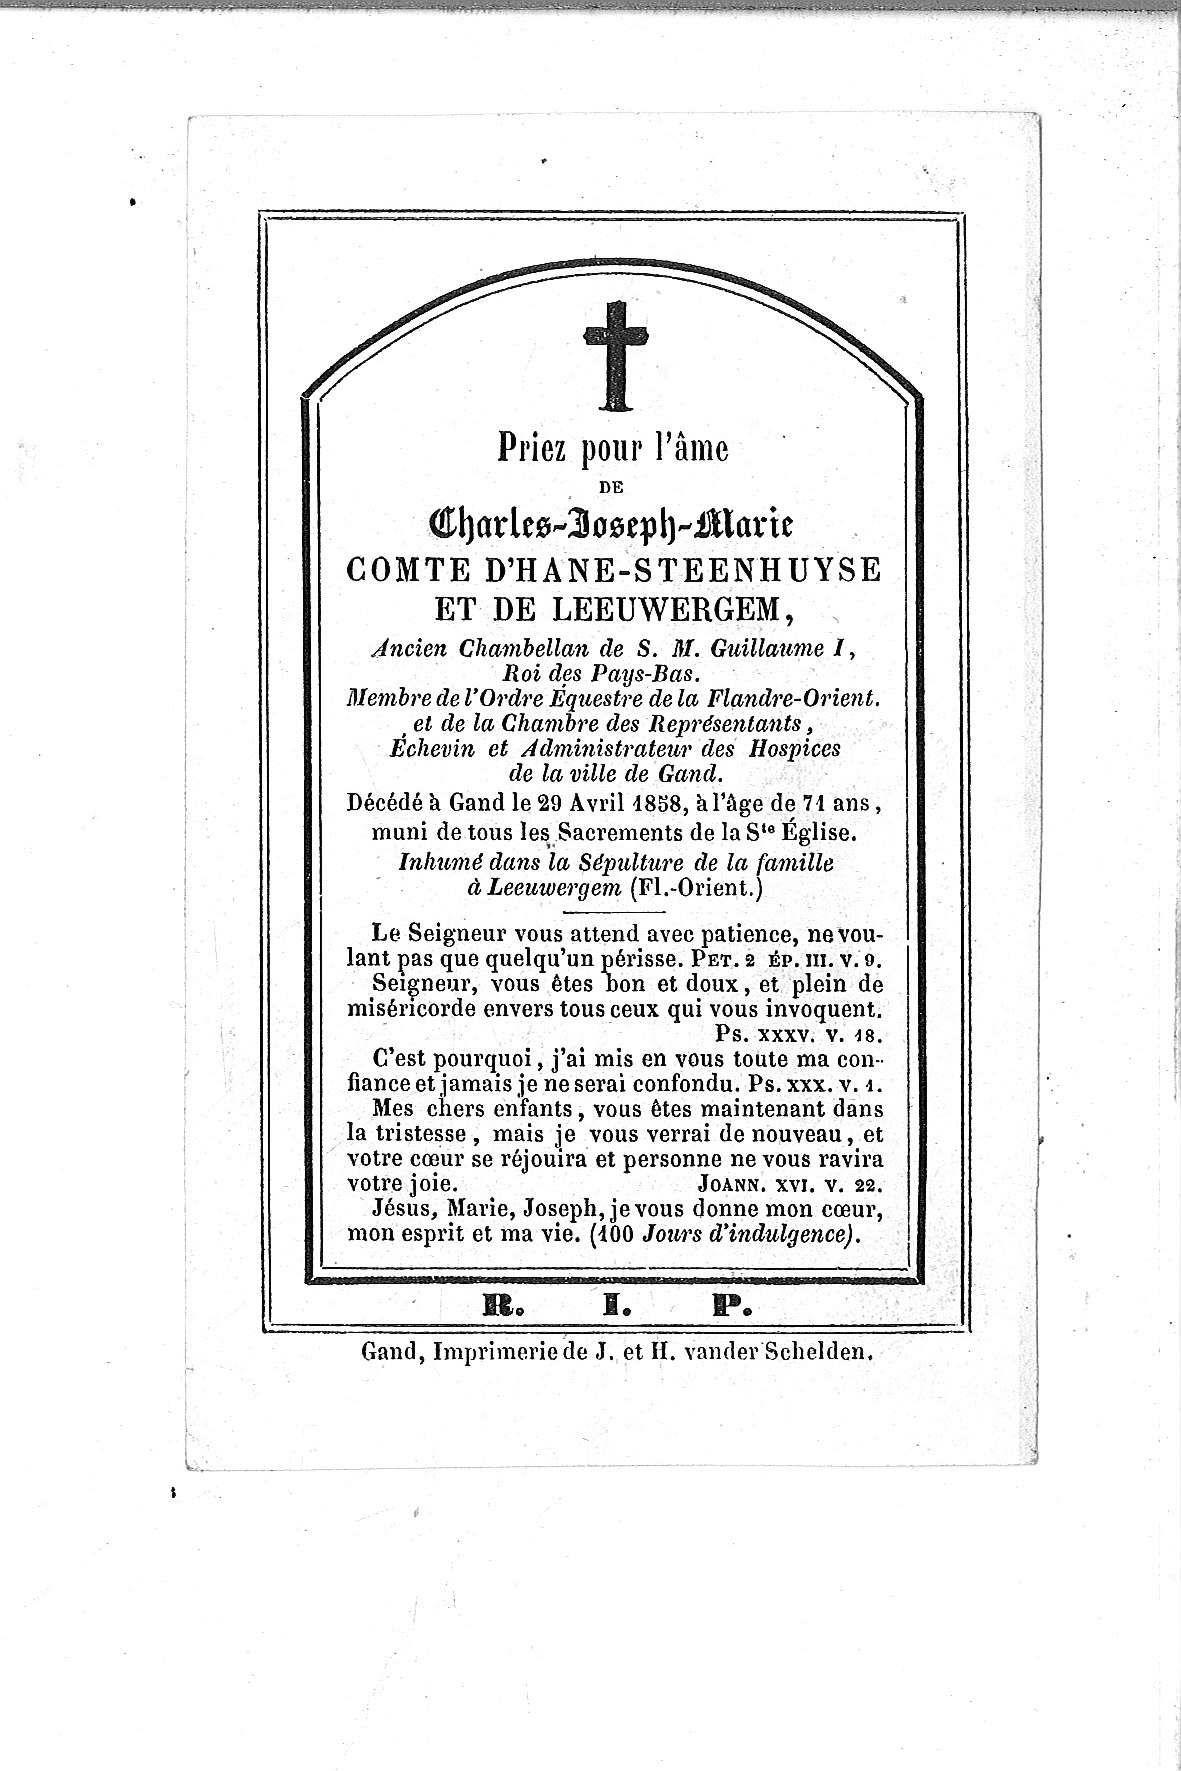 Charles-Joseph-Marie-(1858)-20120919084524_00012.jpg